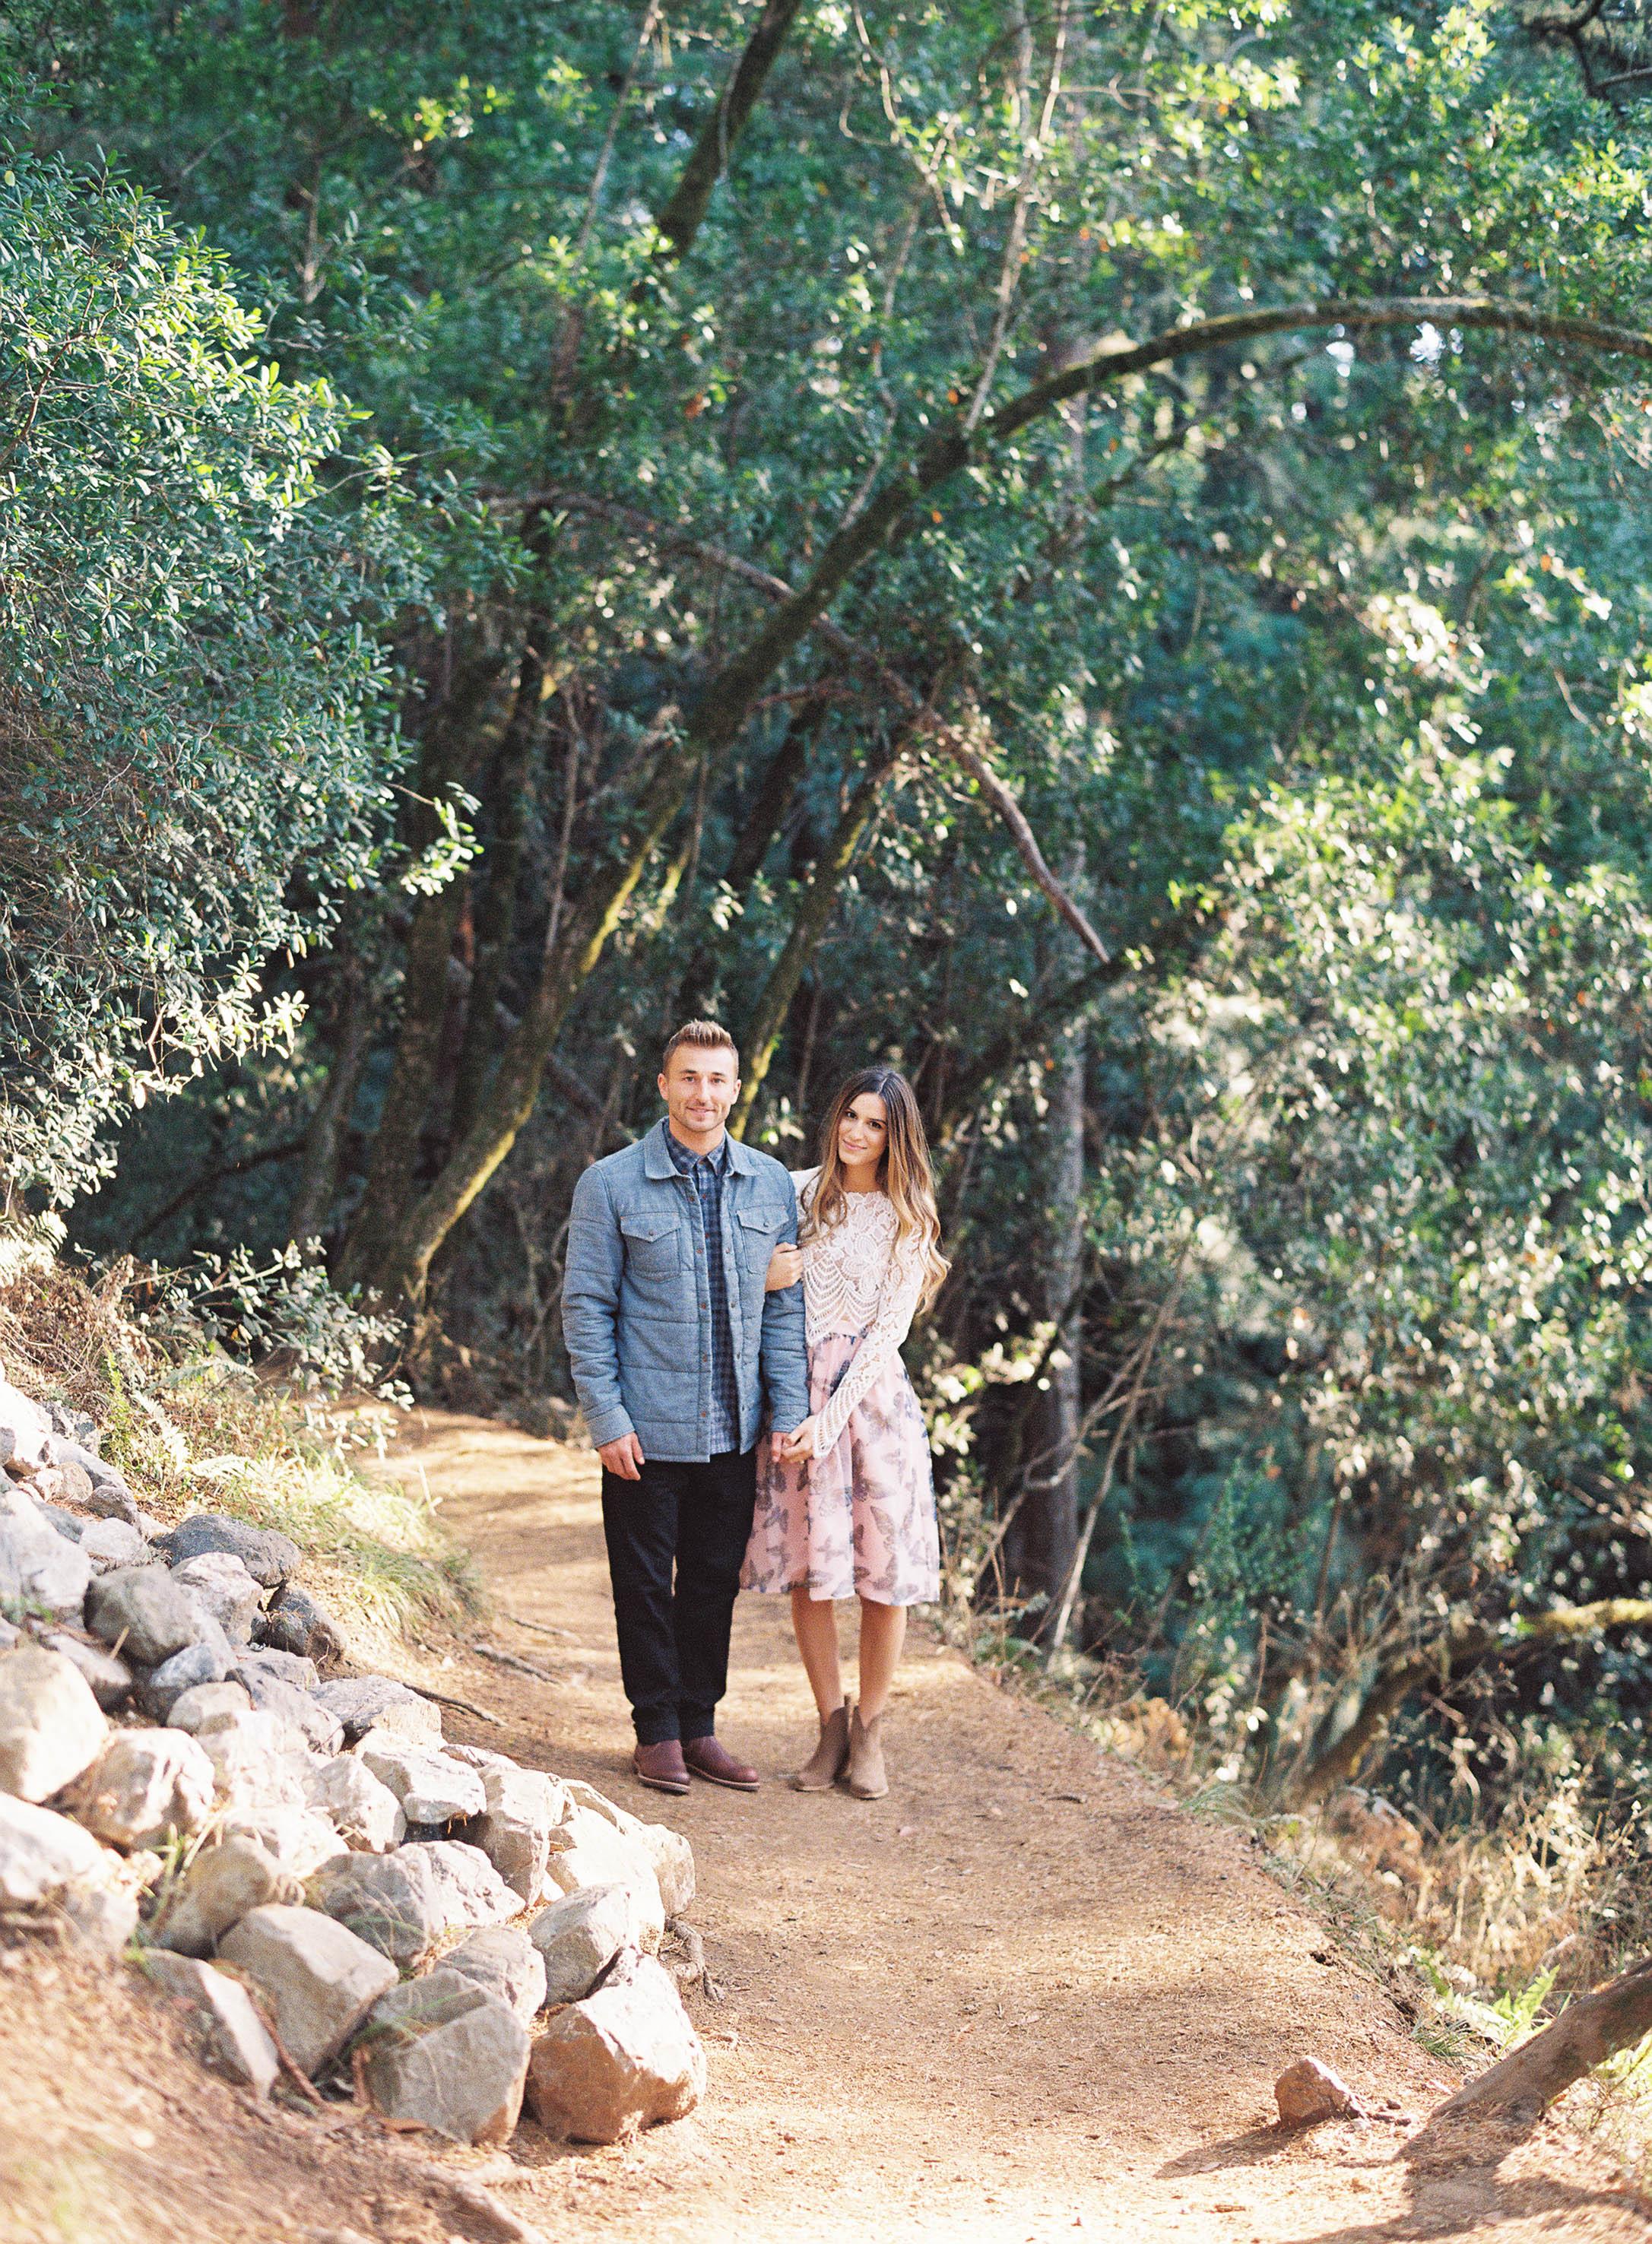 Meghan Mehan Photography - Fine Art Film Wedding Photography - San Francisco | Napa | Sonoma | Big Sur | Chicago | Minneapolis | Milwaukee | Lake Geneva | Door County | Wisconsin 037.jpg